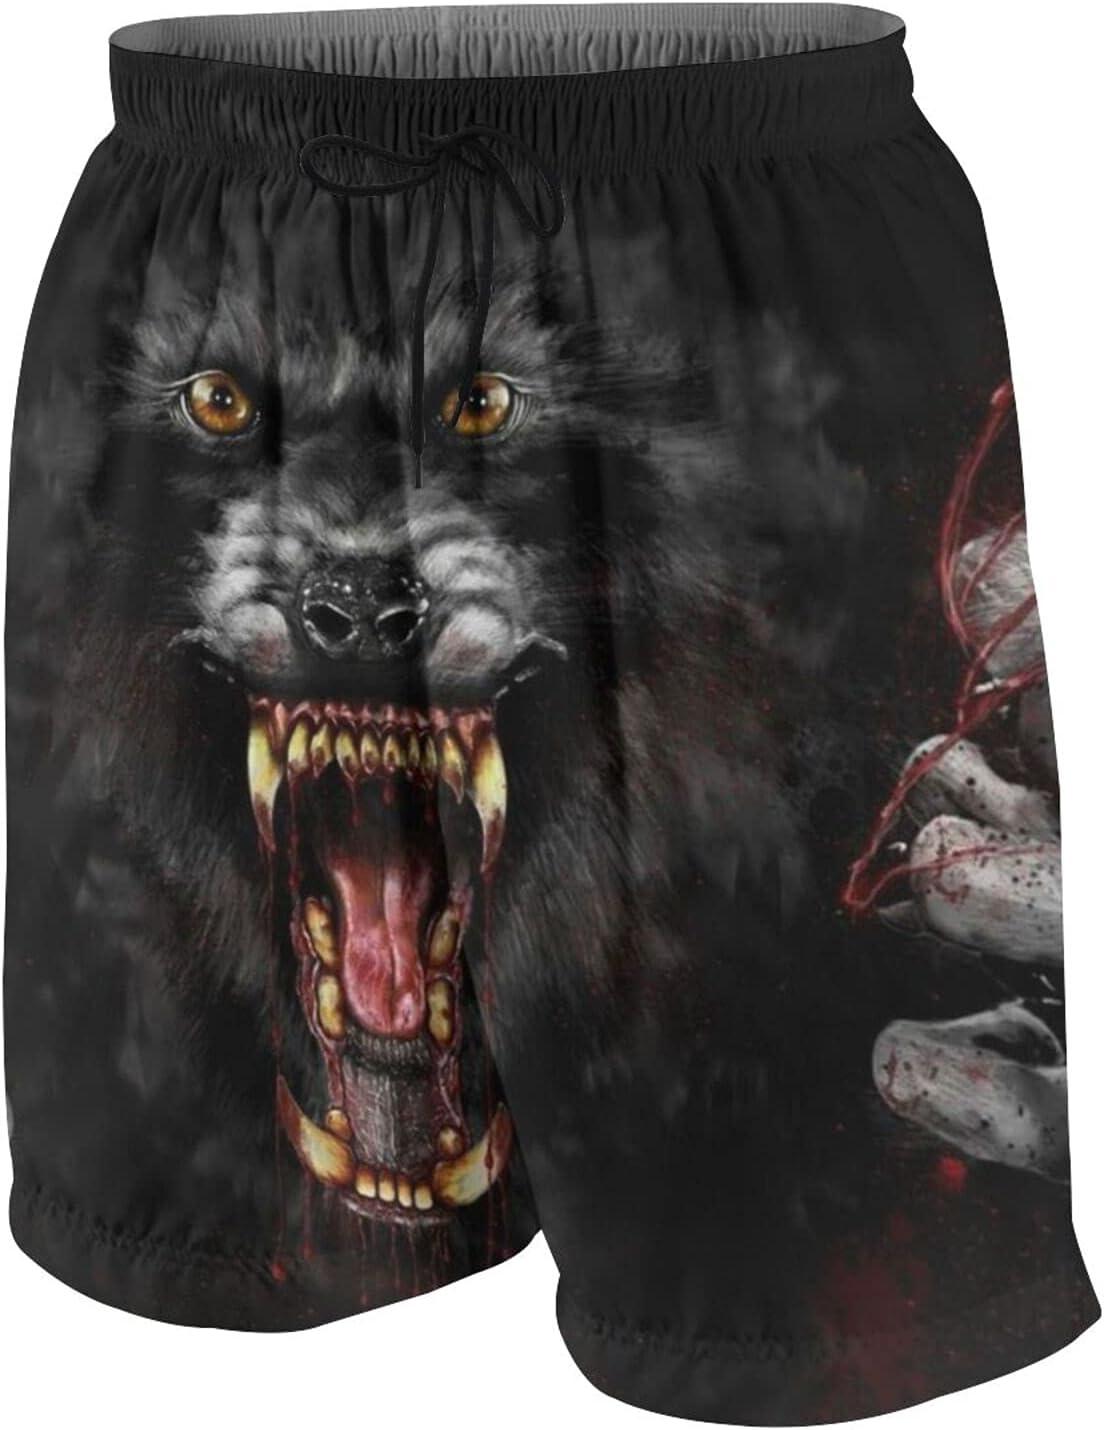 KAETZRU Boys Swim Trunks Beach Board Shorts Demon Wolf Scary Claw Red Blood Teens Quick Dry Swimsuit